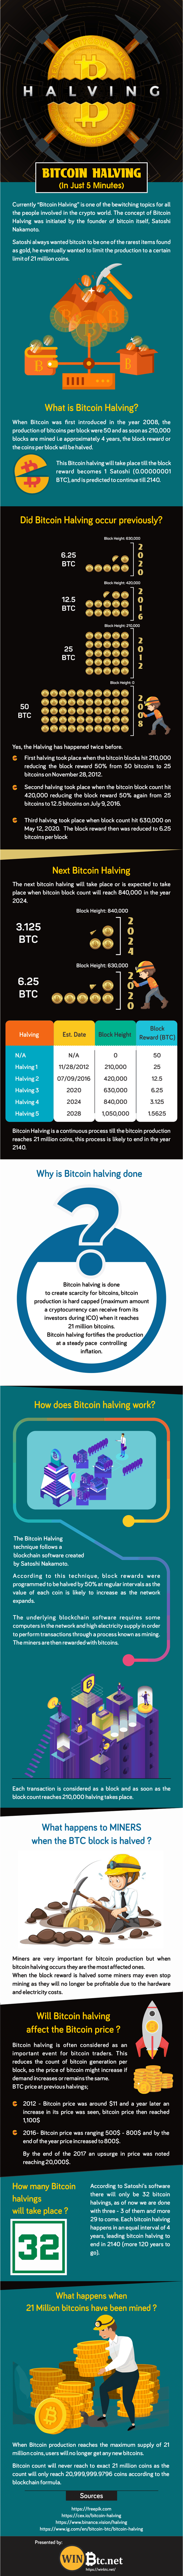 Bitcoin Halving Definitive Guide